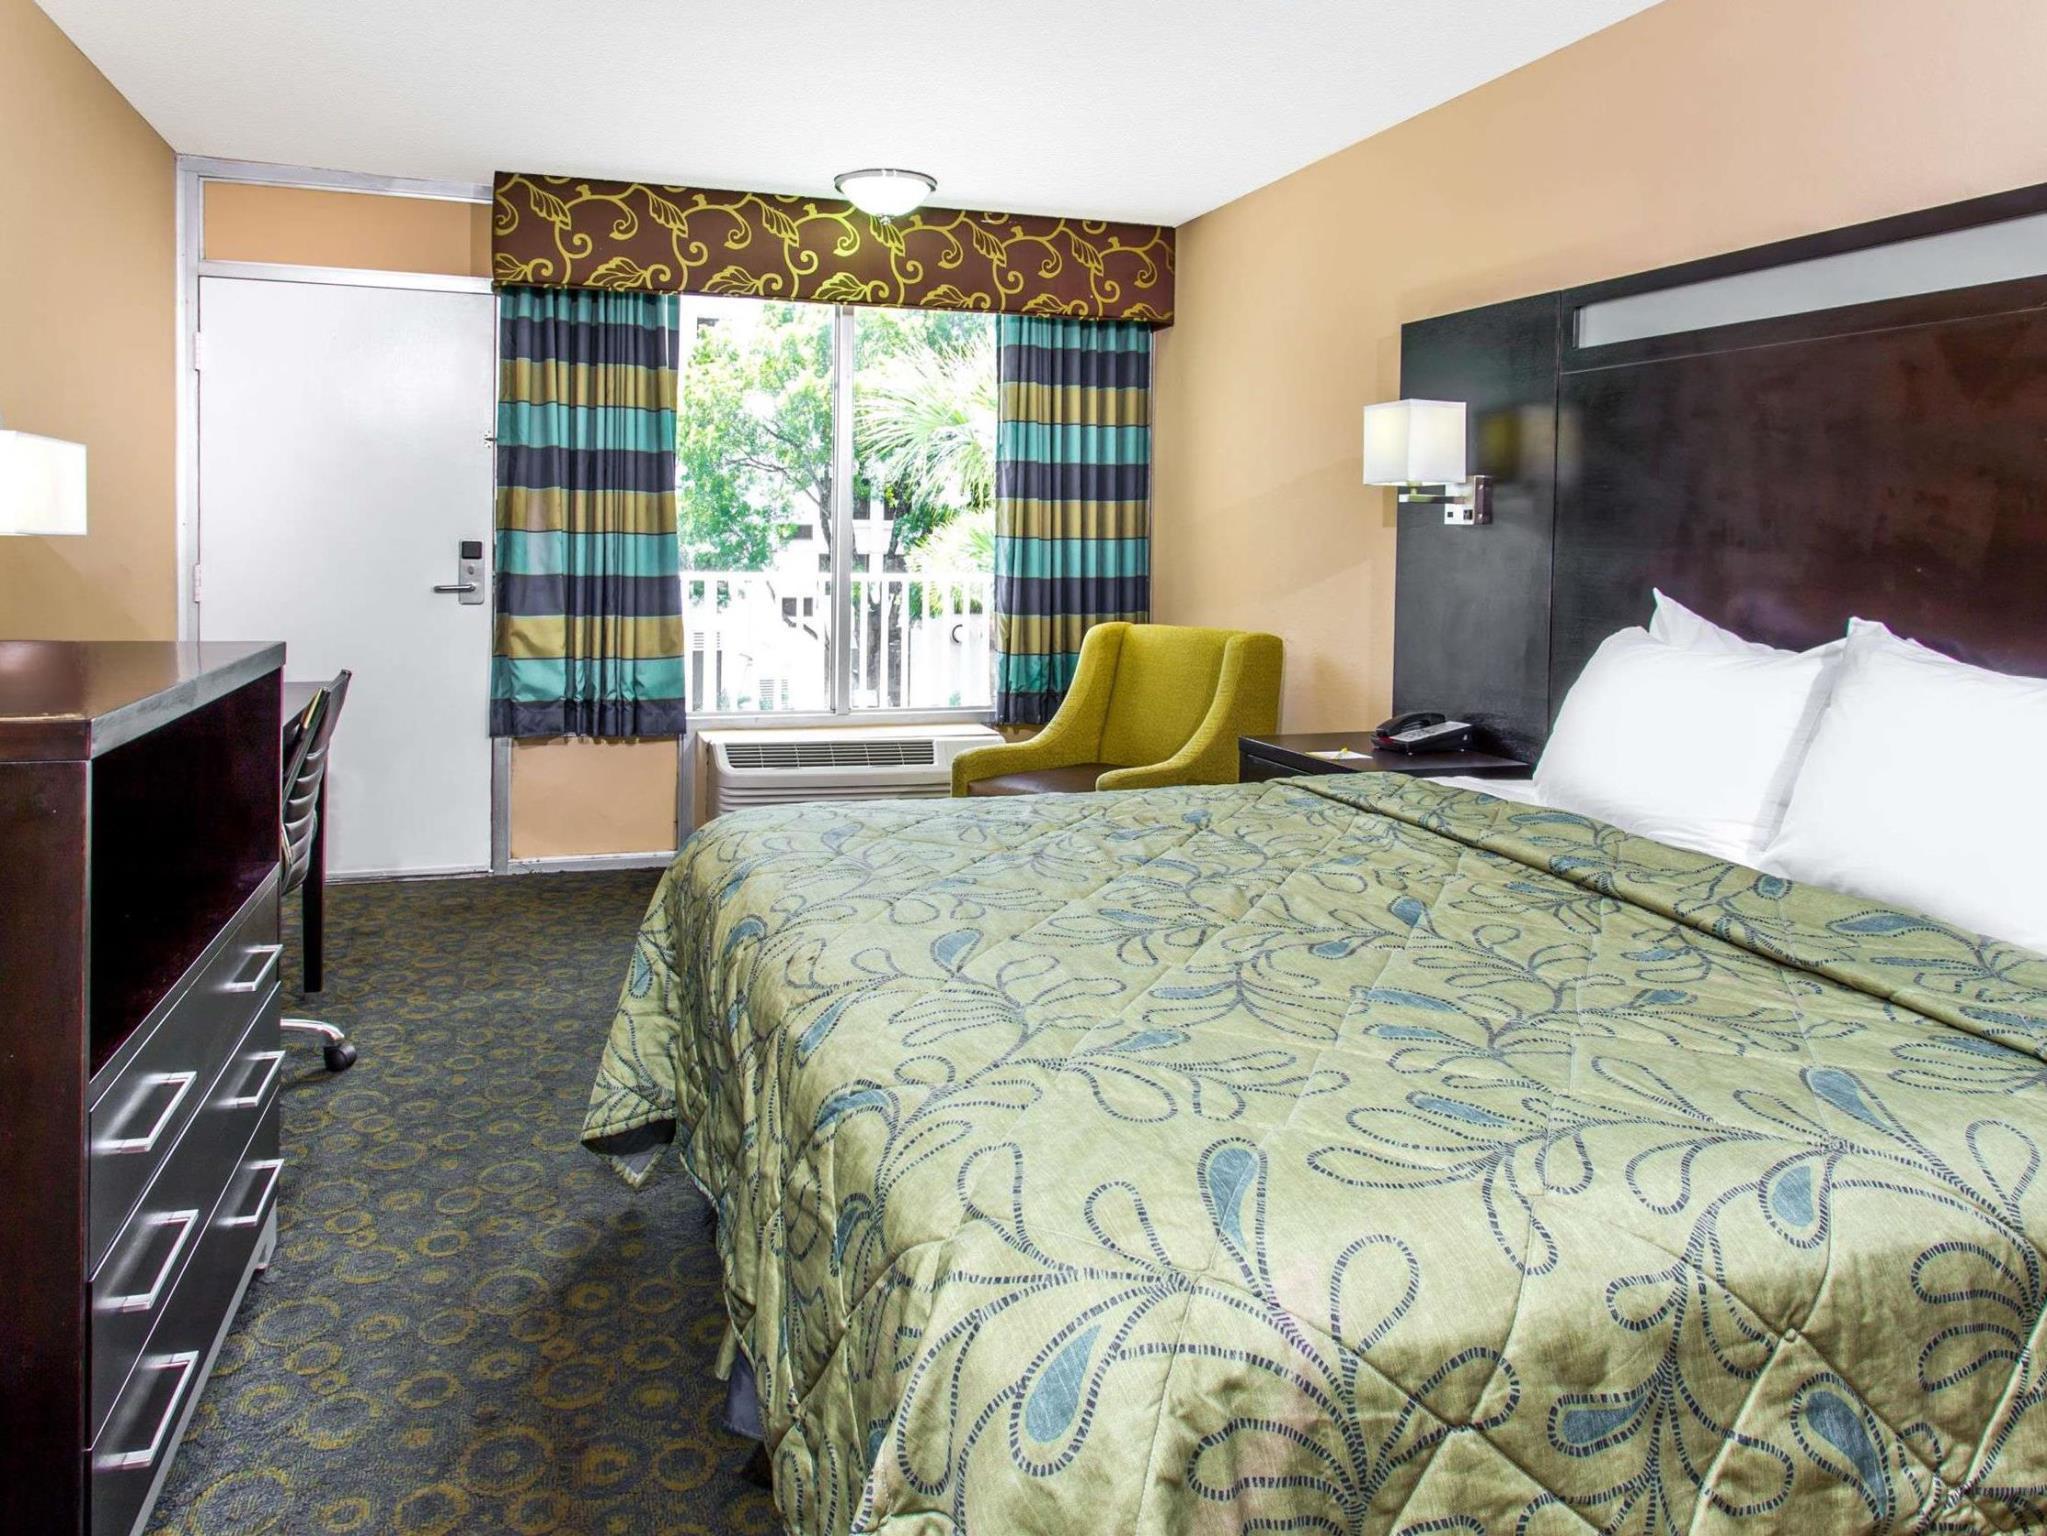 Best Price On Days Inn By Wyndham Fort Lauderdale Airport